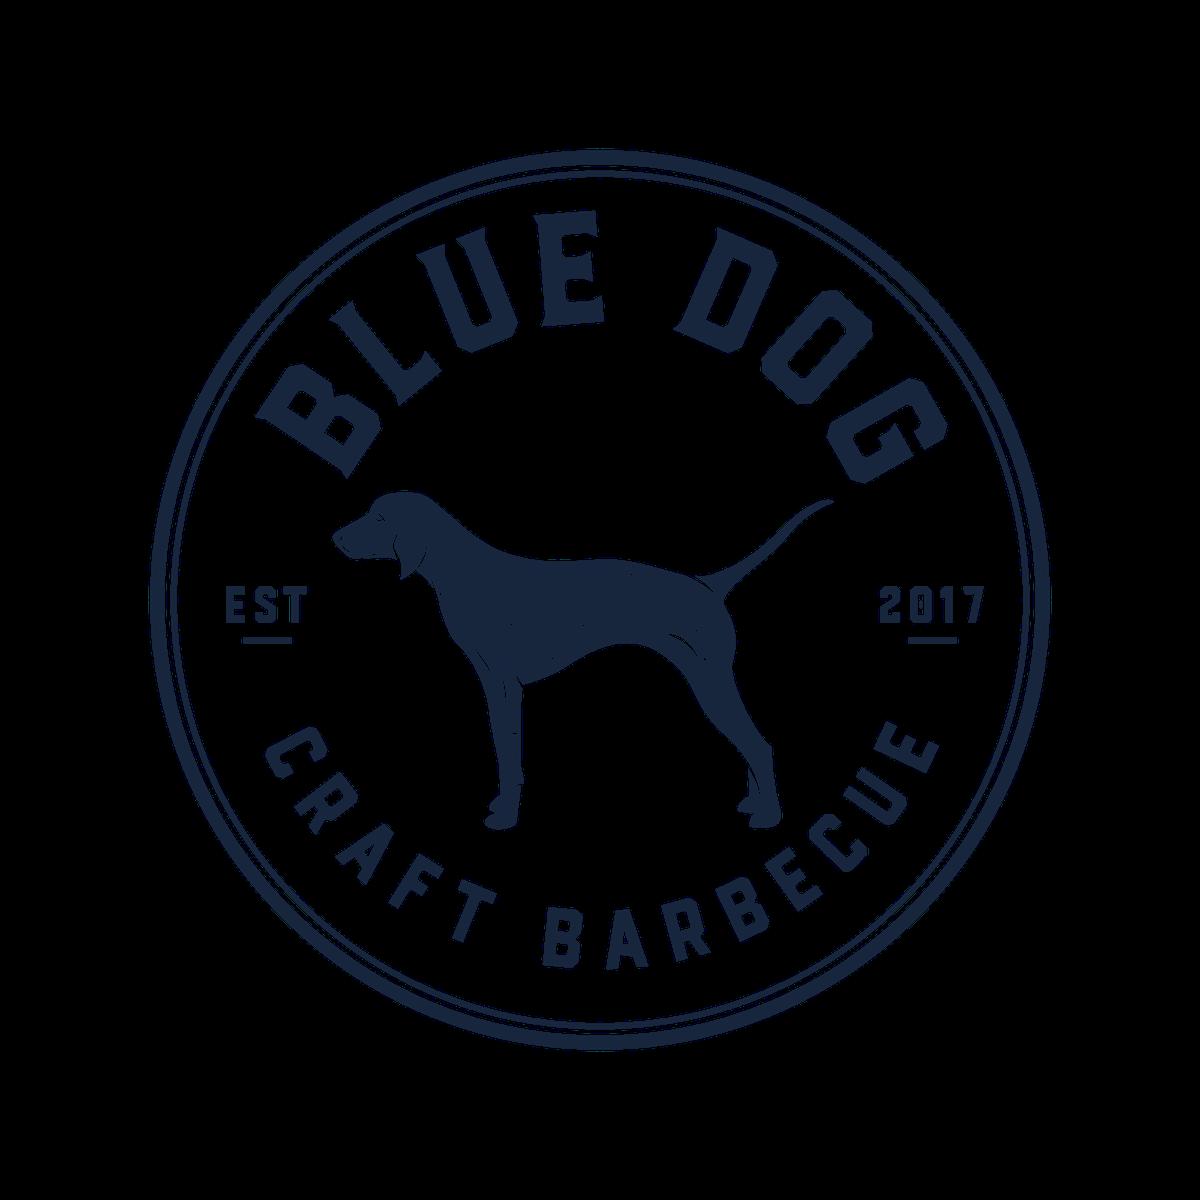 Logo design for Blue Dog Craft Barbecue